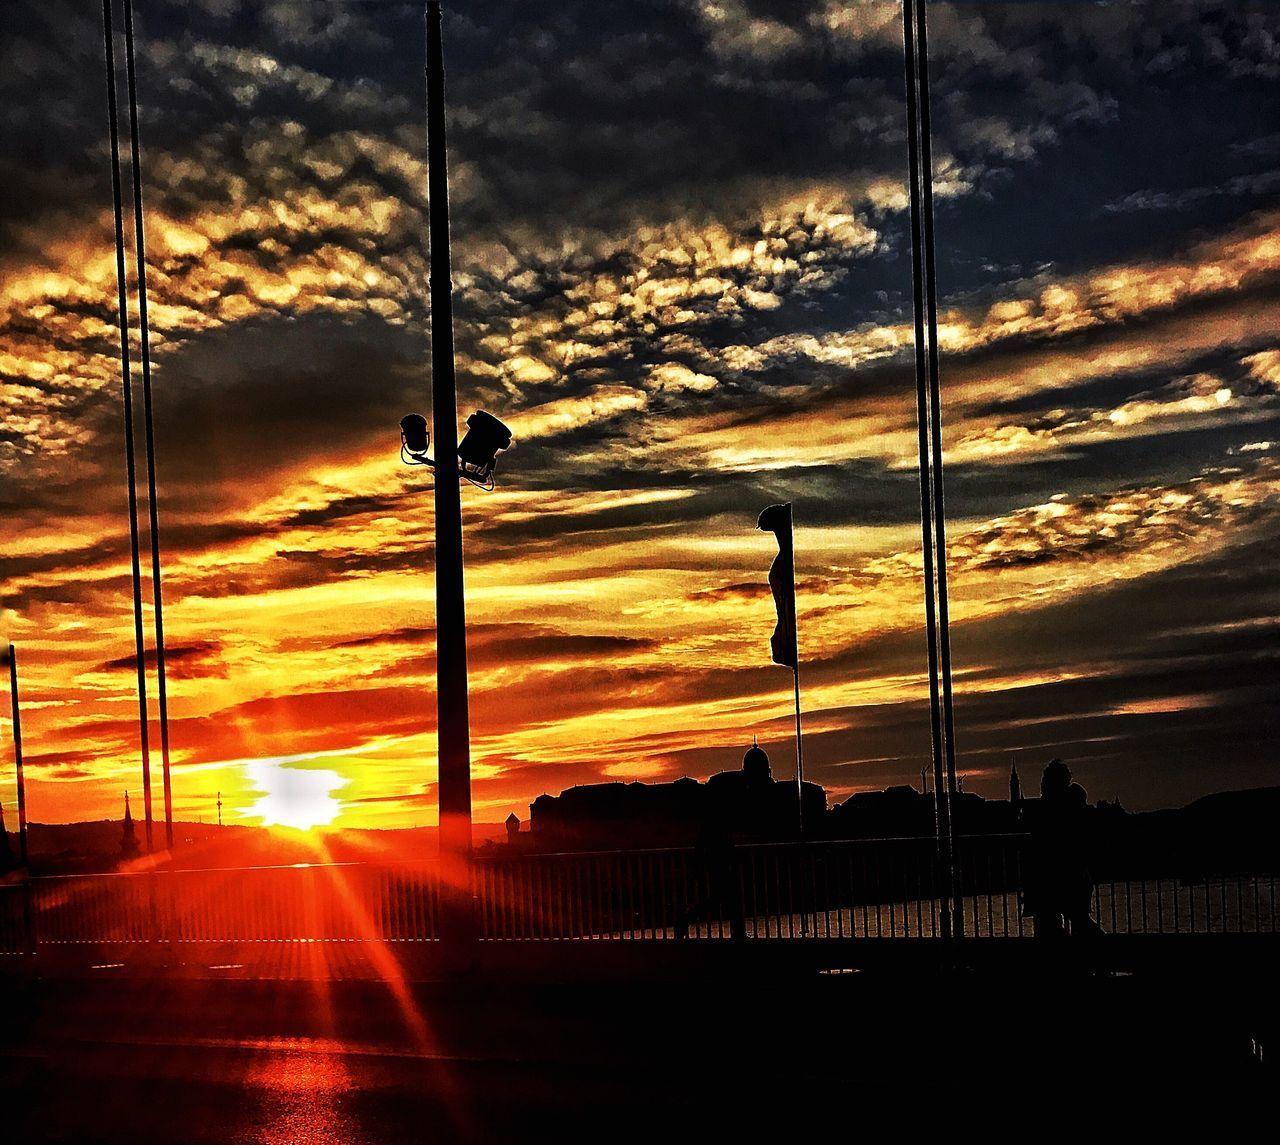 sunset, cloud - sky, sky, silhouette, sun, orange color, sunbeam, sunlight, nature, no people, built structure, transportation, outdoors, architecture, beauty in nature, scenics, day